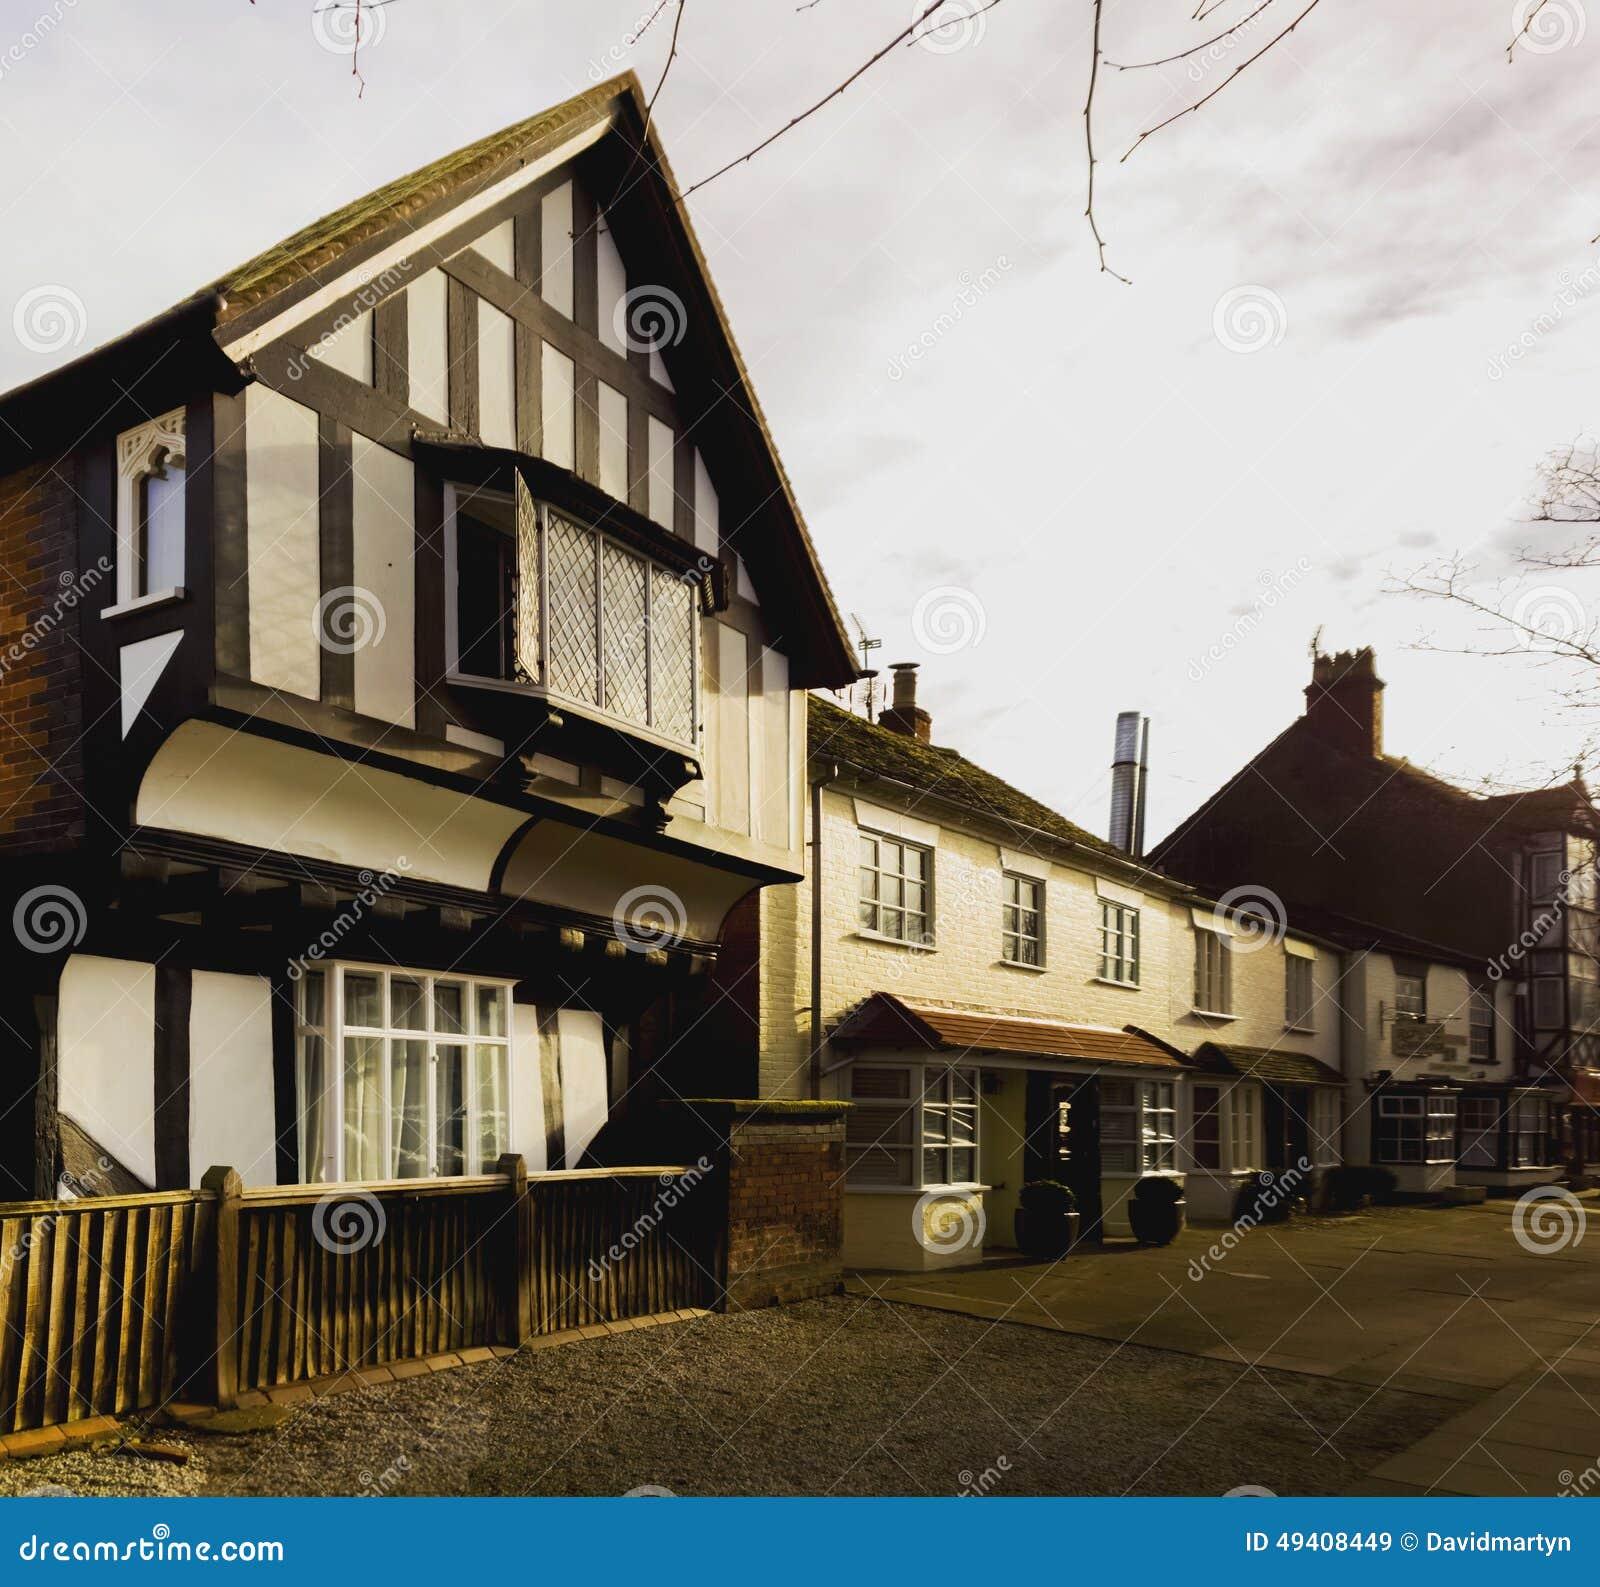 Download Dorf stockbild. Bild von halb, real, haupt, england, groß - 49408449